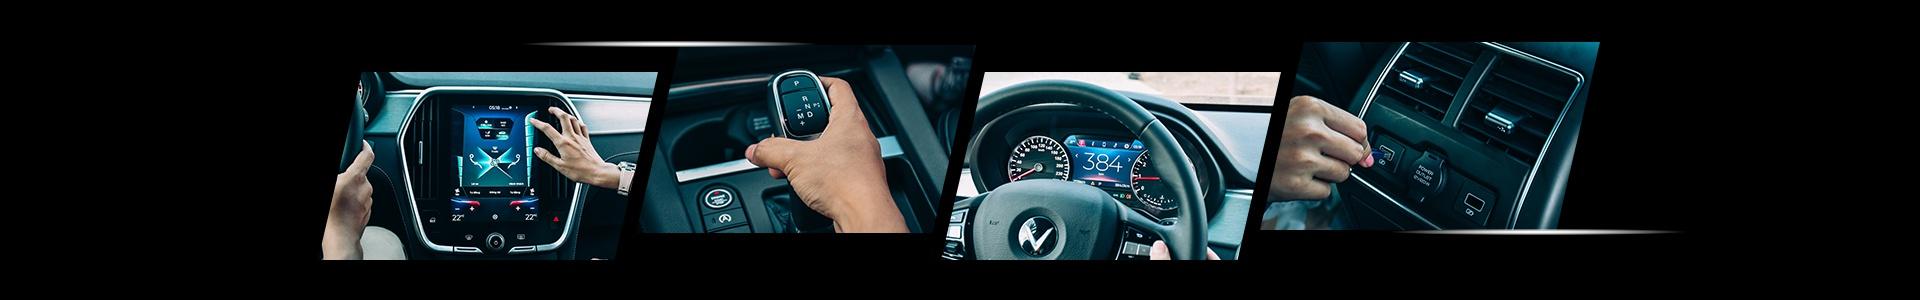 Nội thất xe vinfast Lux SA